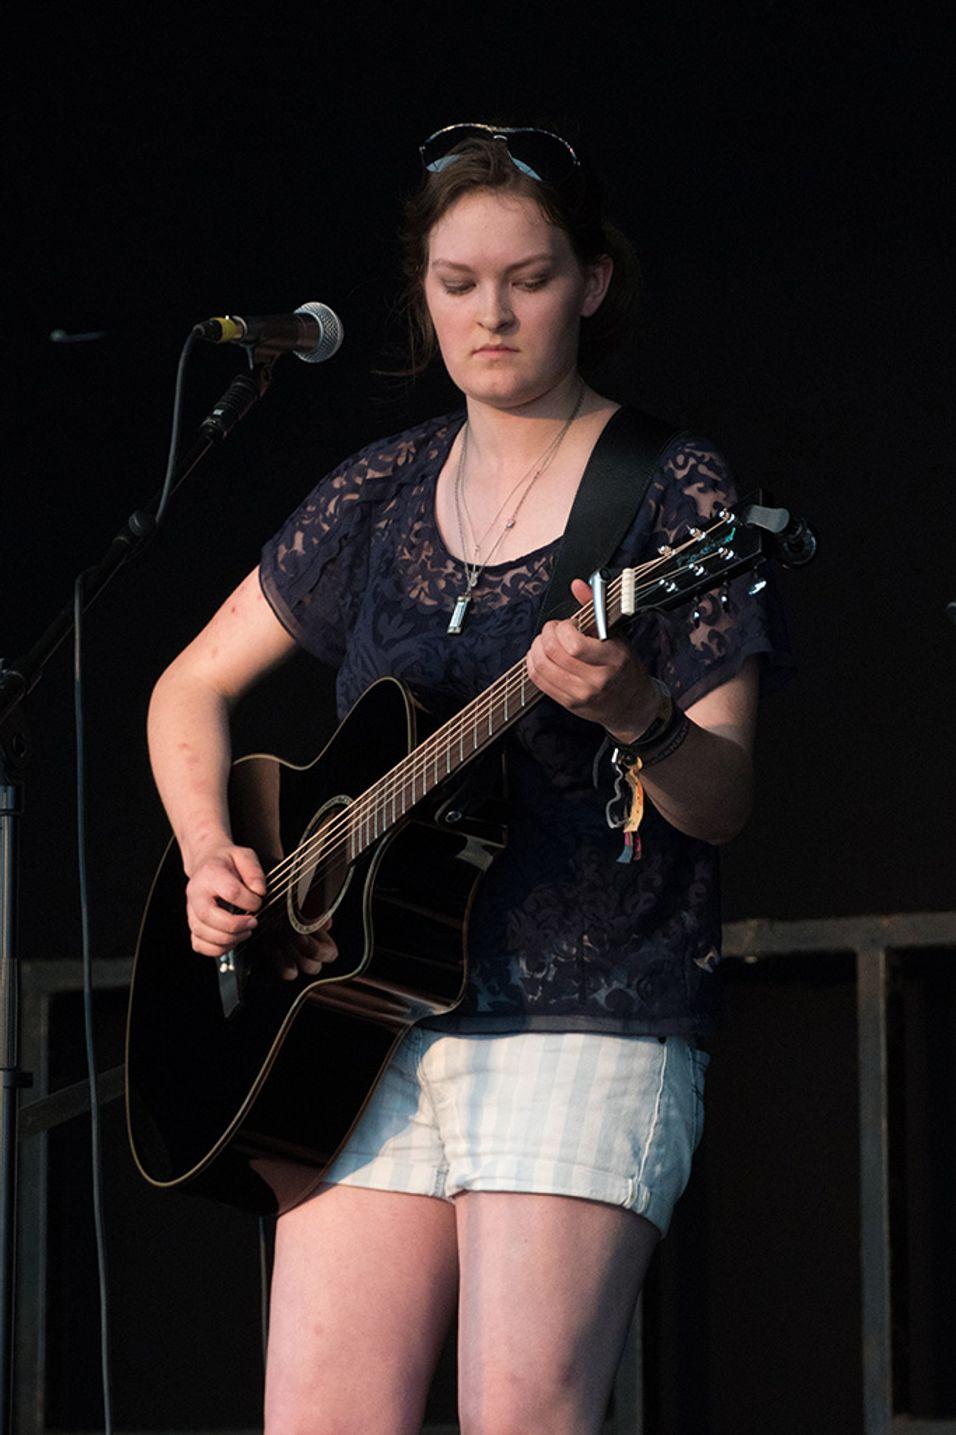 Cambridge Folk Festival 2016 - Iona Lane - Photocredit Neil King (1).jpg